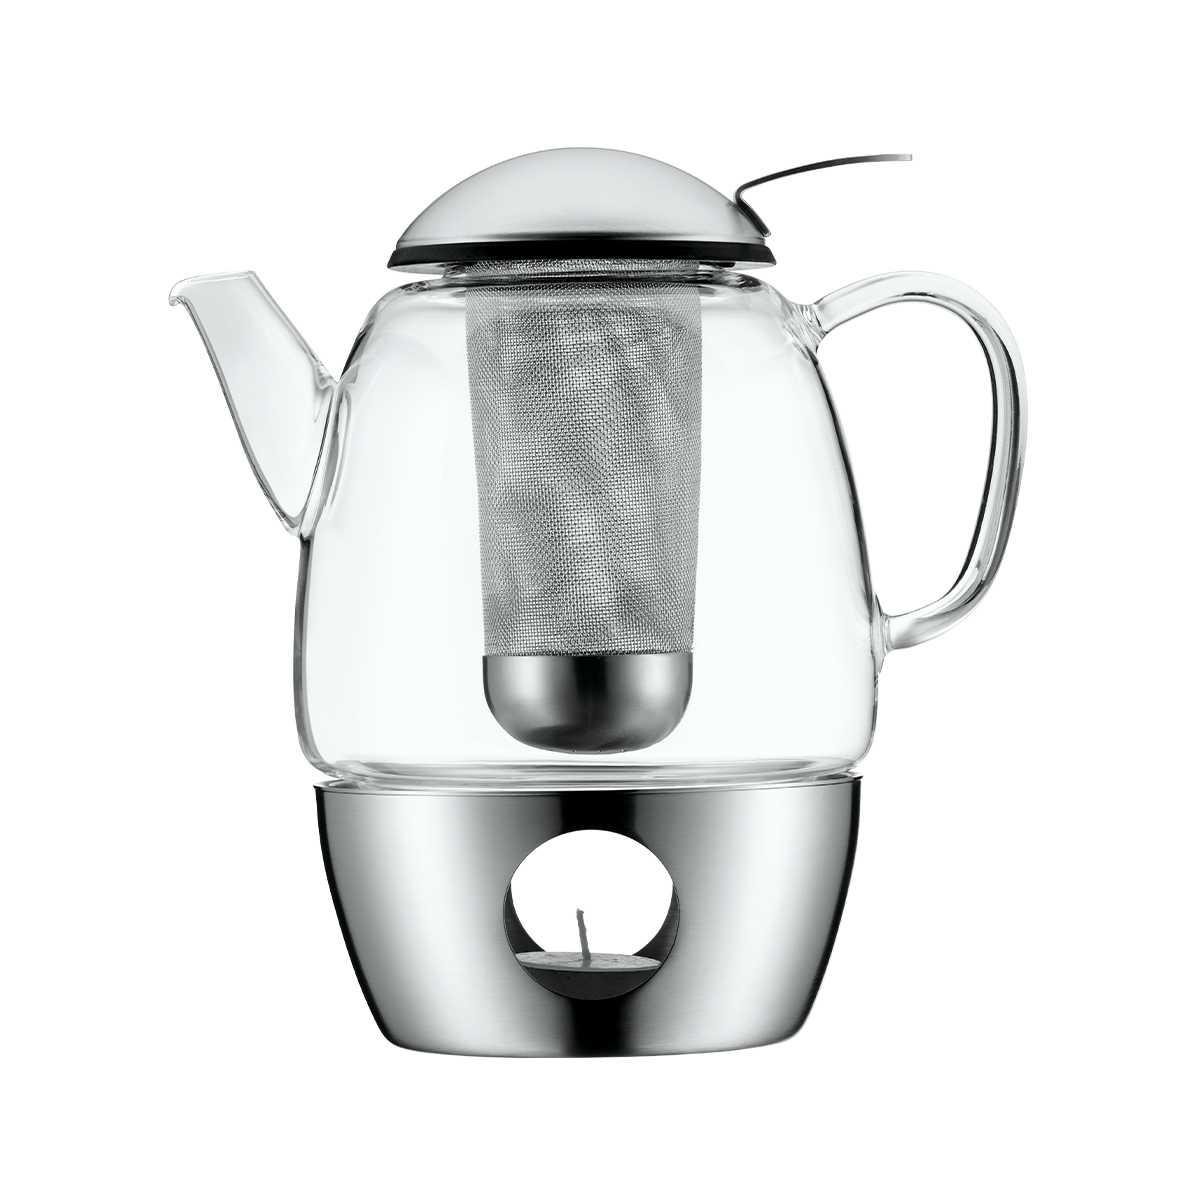 Онлайн каталог PROMENU: Чайник заварочный с подогревом WMF COFFEE AND TEA, объем 1 л, прозрачный WMF 06 3109 6030